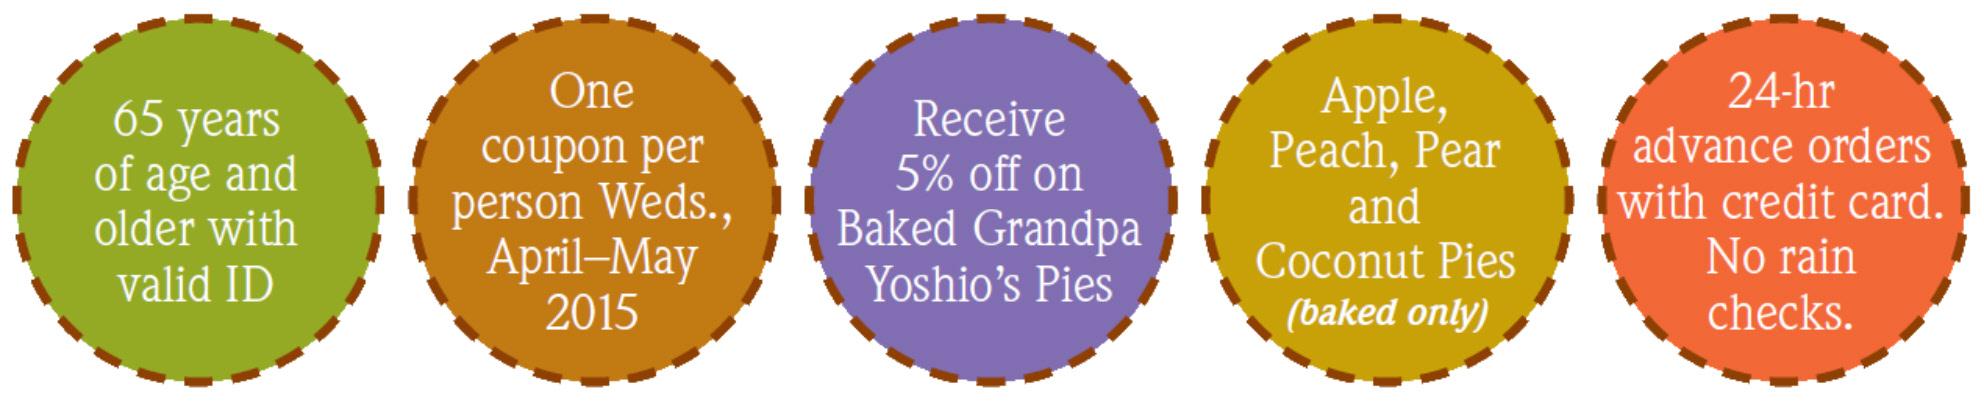 Generations Magazine -Hawaiian Pie Company Honors Great-Grandfather's Baking Legacy - Image 06